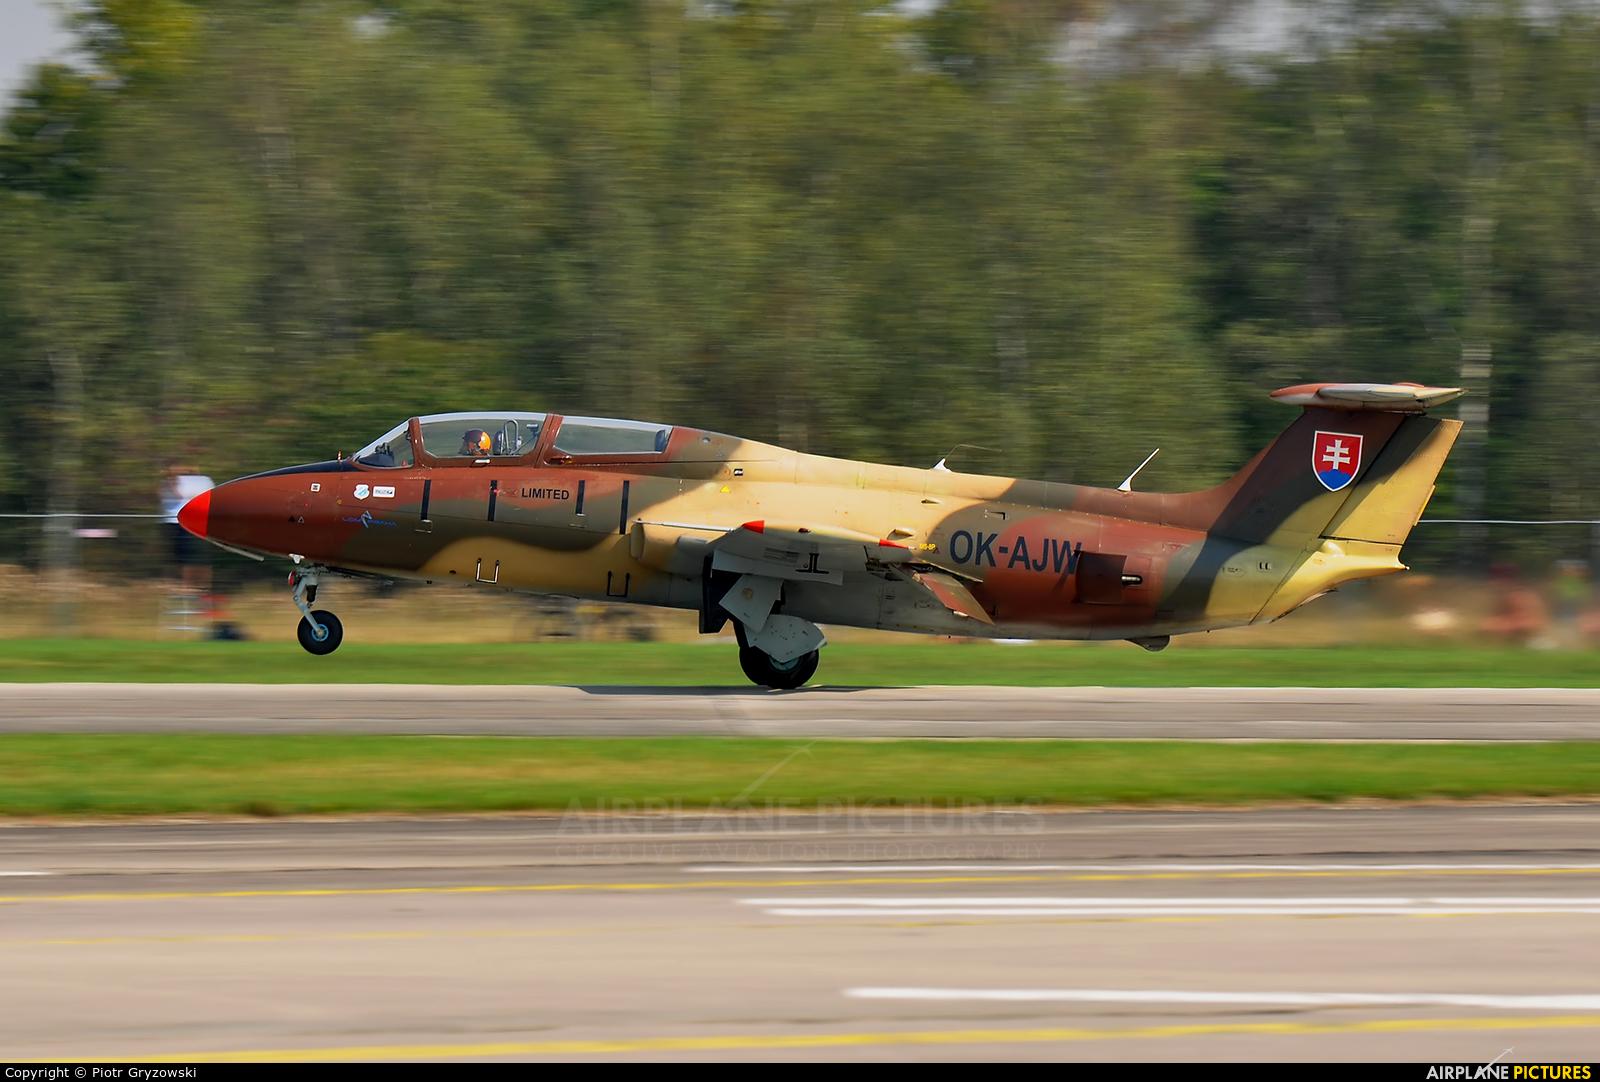 Blue Sky Service OK-AJW aircraft at Hradec Králové